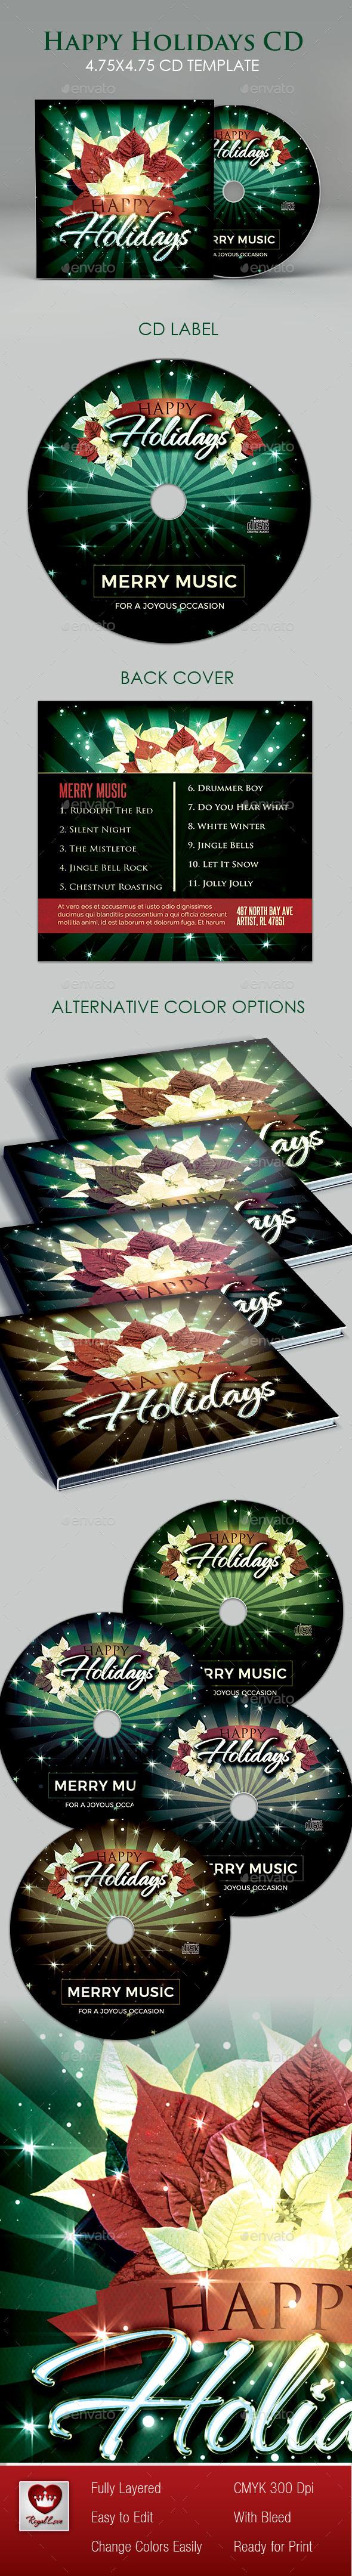 Happy Holidays CD Artwork - CD & DVD Artwork Print Templates